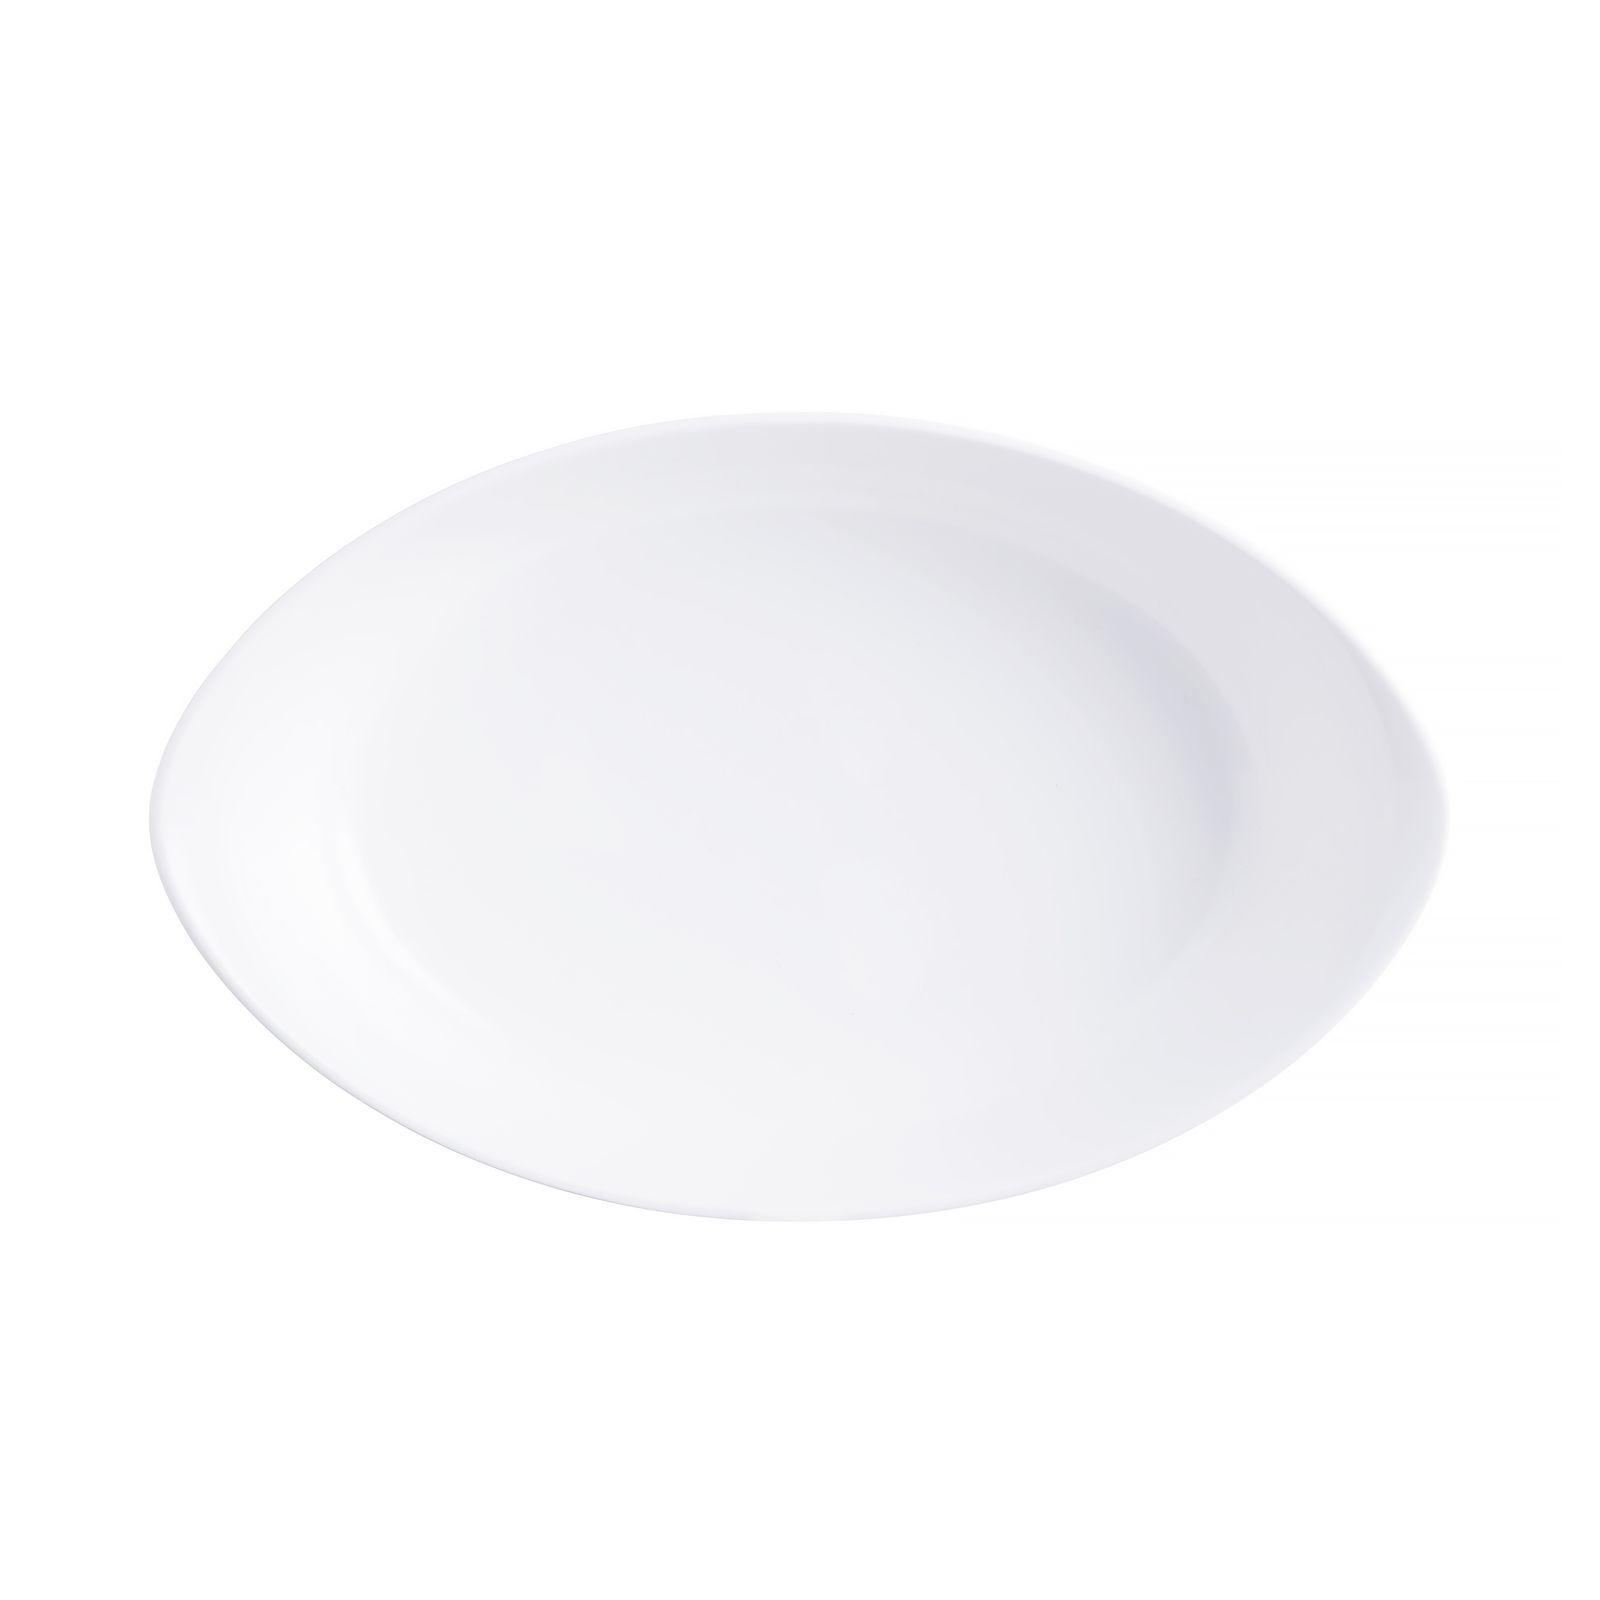 Ugnsform oval Smart Cuisine 32 x 20 cm LUMINARC